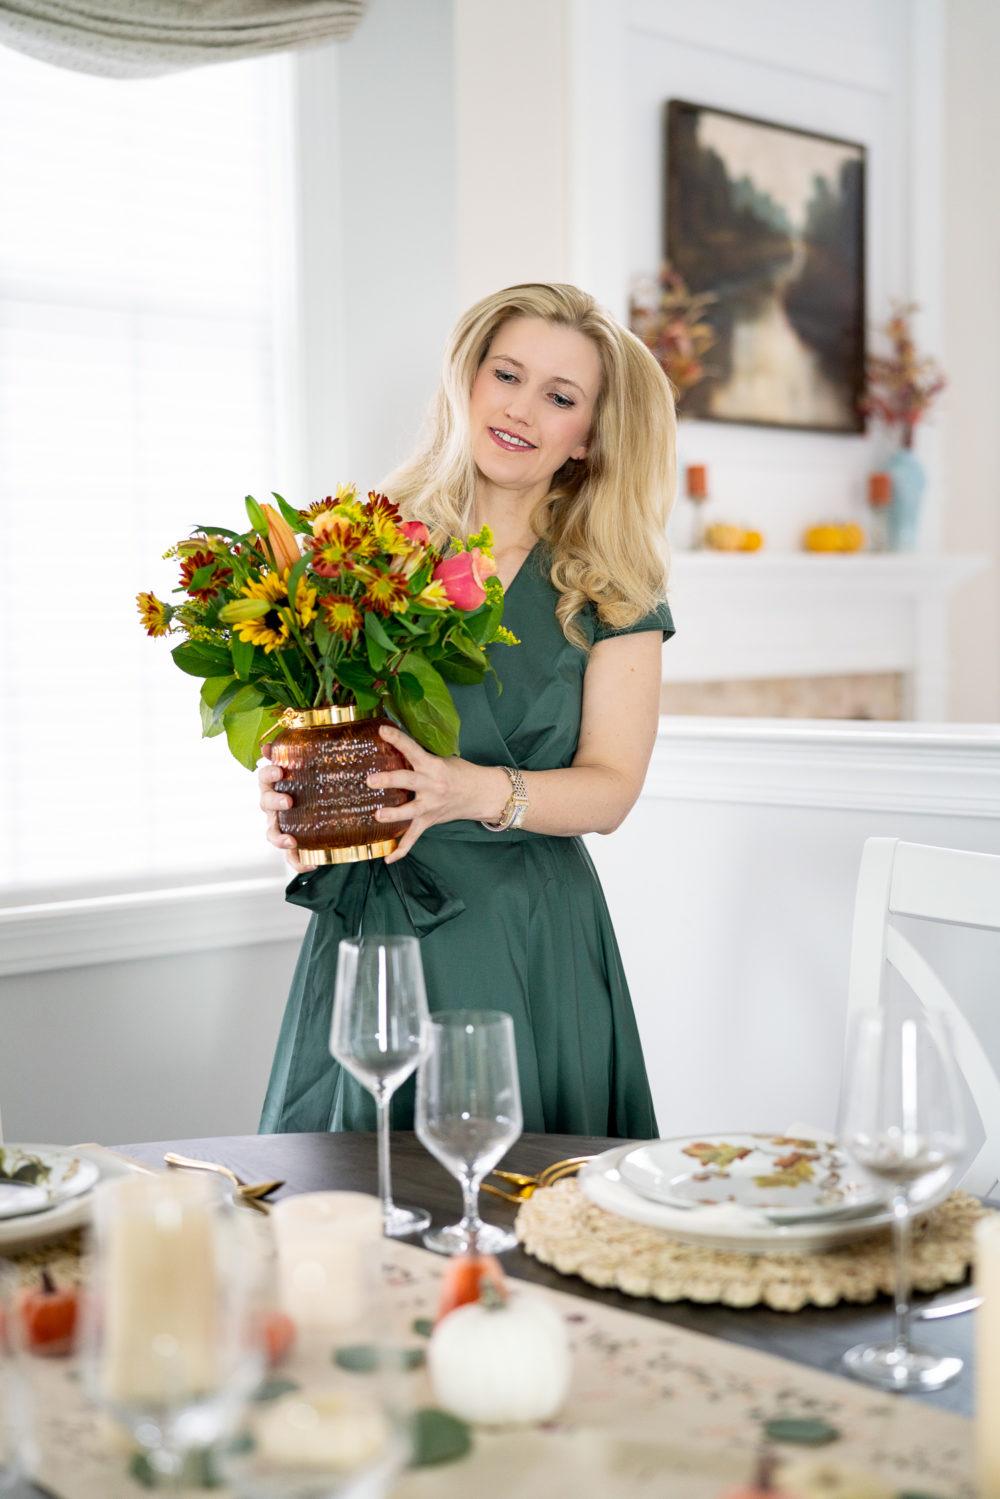 Petite Fashion Blog | Addison Cotton Tie Waist Fit & Flare Wrap Dress | FTD Flowers | FTD Thanksgiving Bouquet | Thanksgiving table decor | Thanksgiving tablescape | Pumpkin Pie recipe | Gal Meets Glam Dress